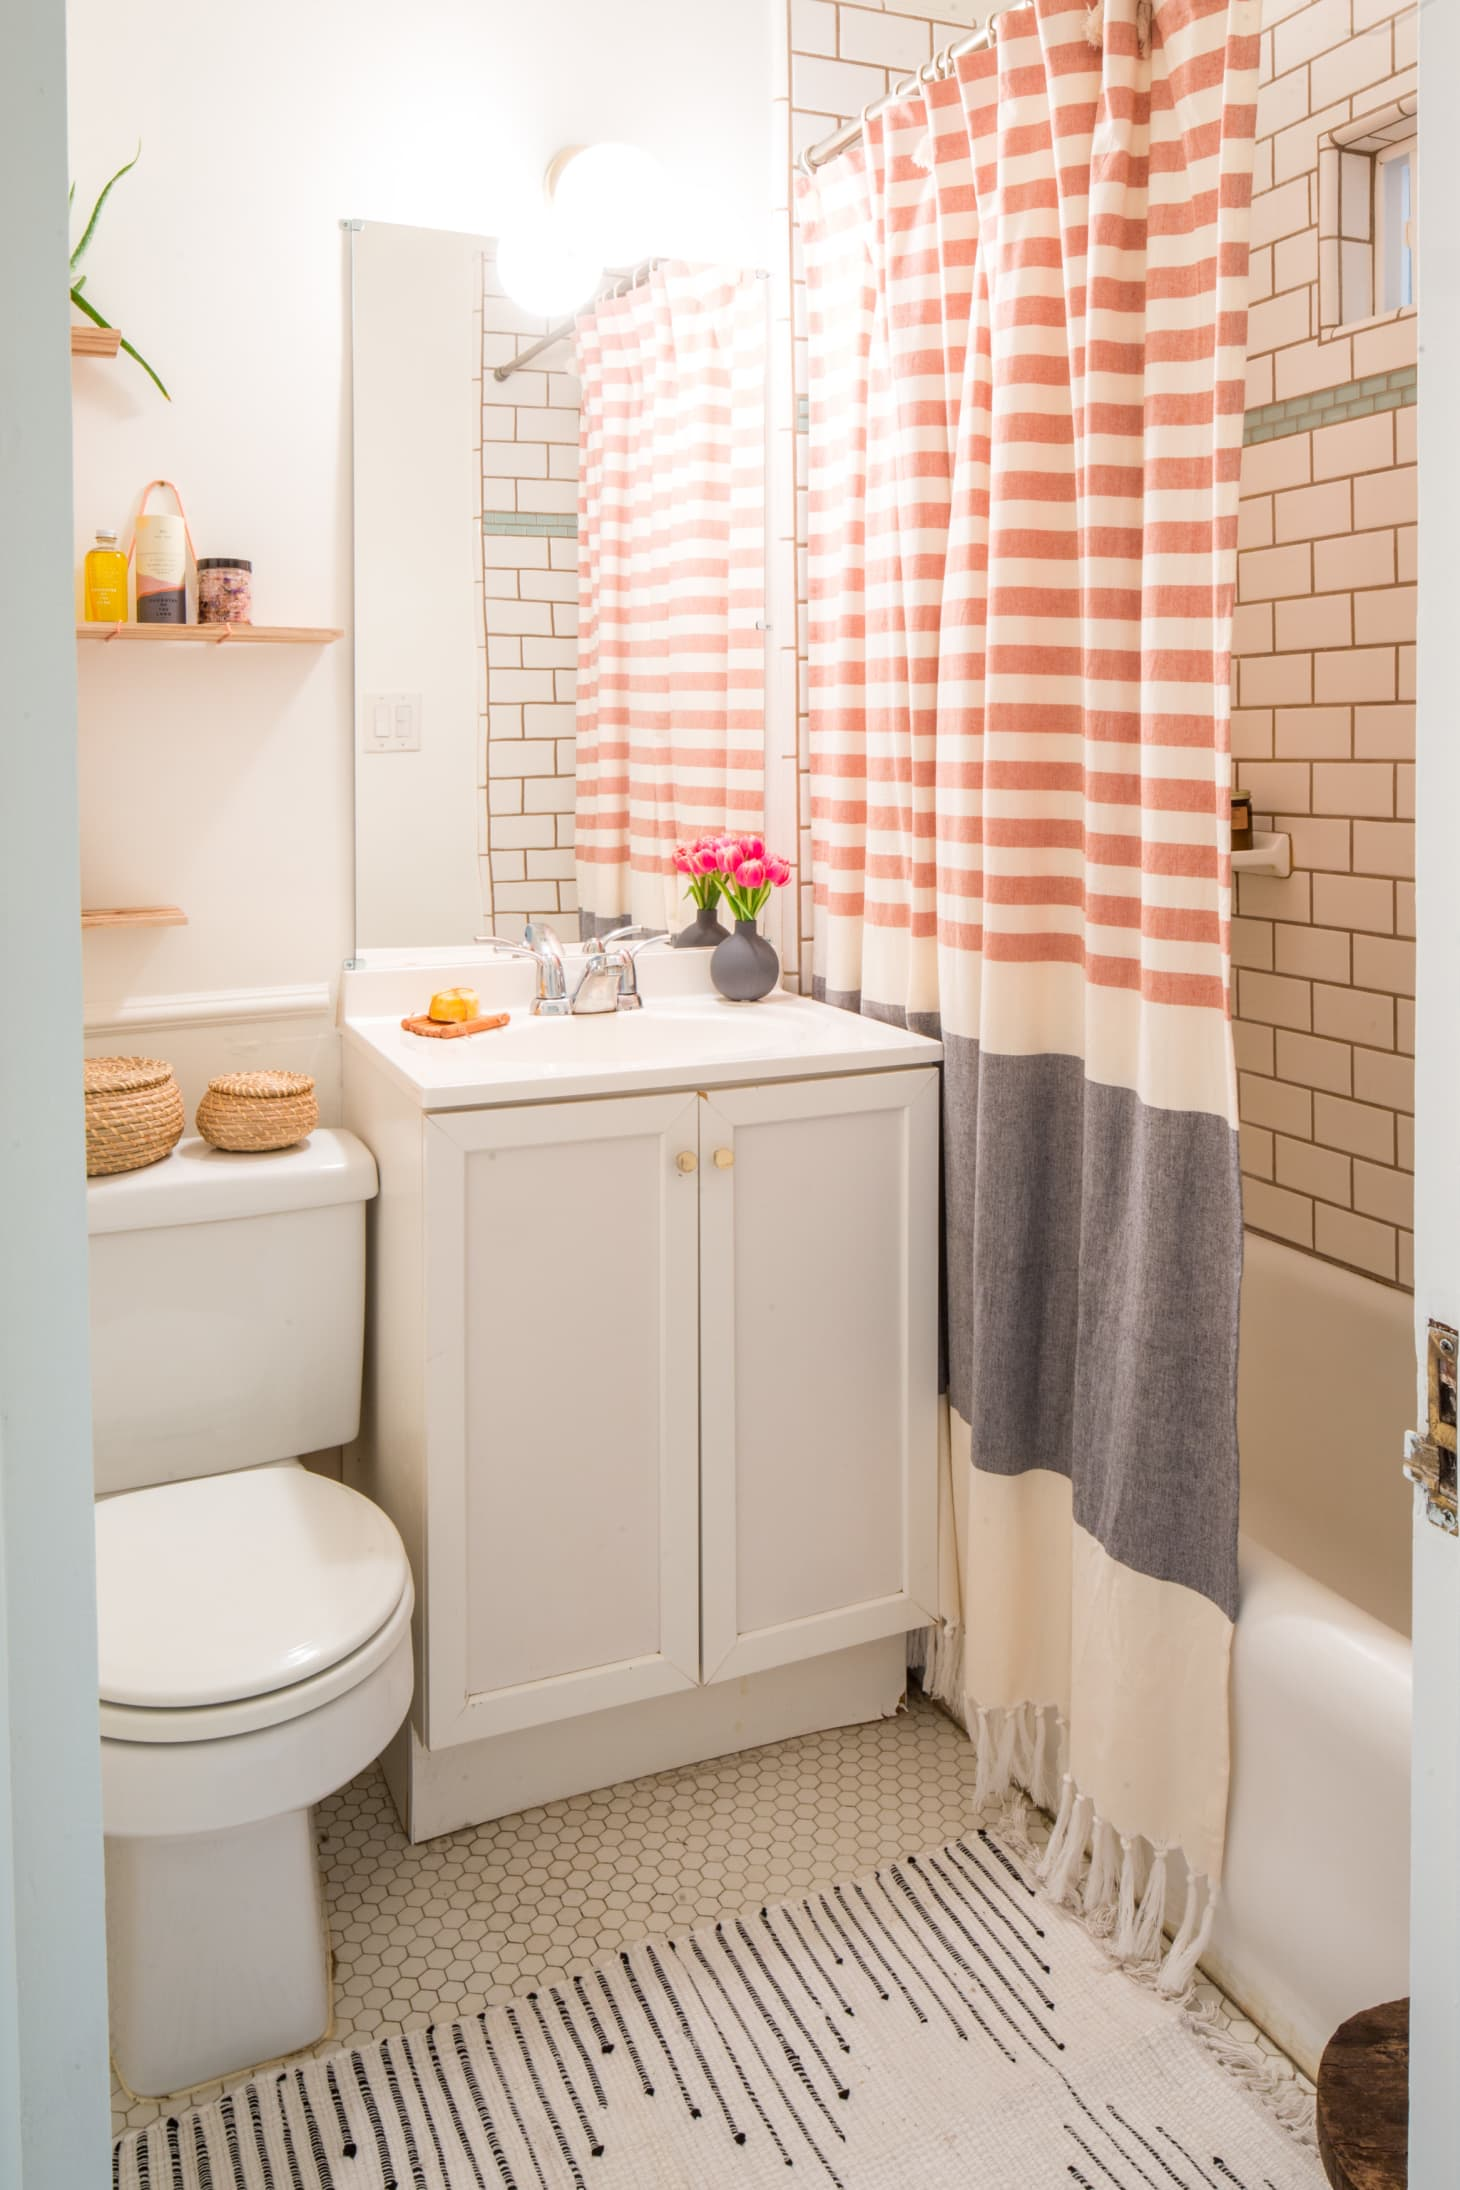 25 Small Bathroom Storage & Design Ideas - Storage ... on Small Apartment Bathroom Storage Ideas  id=63657